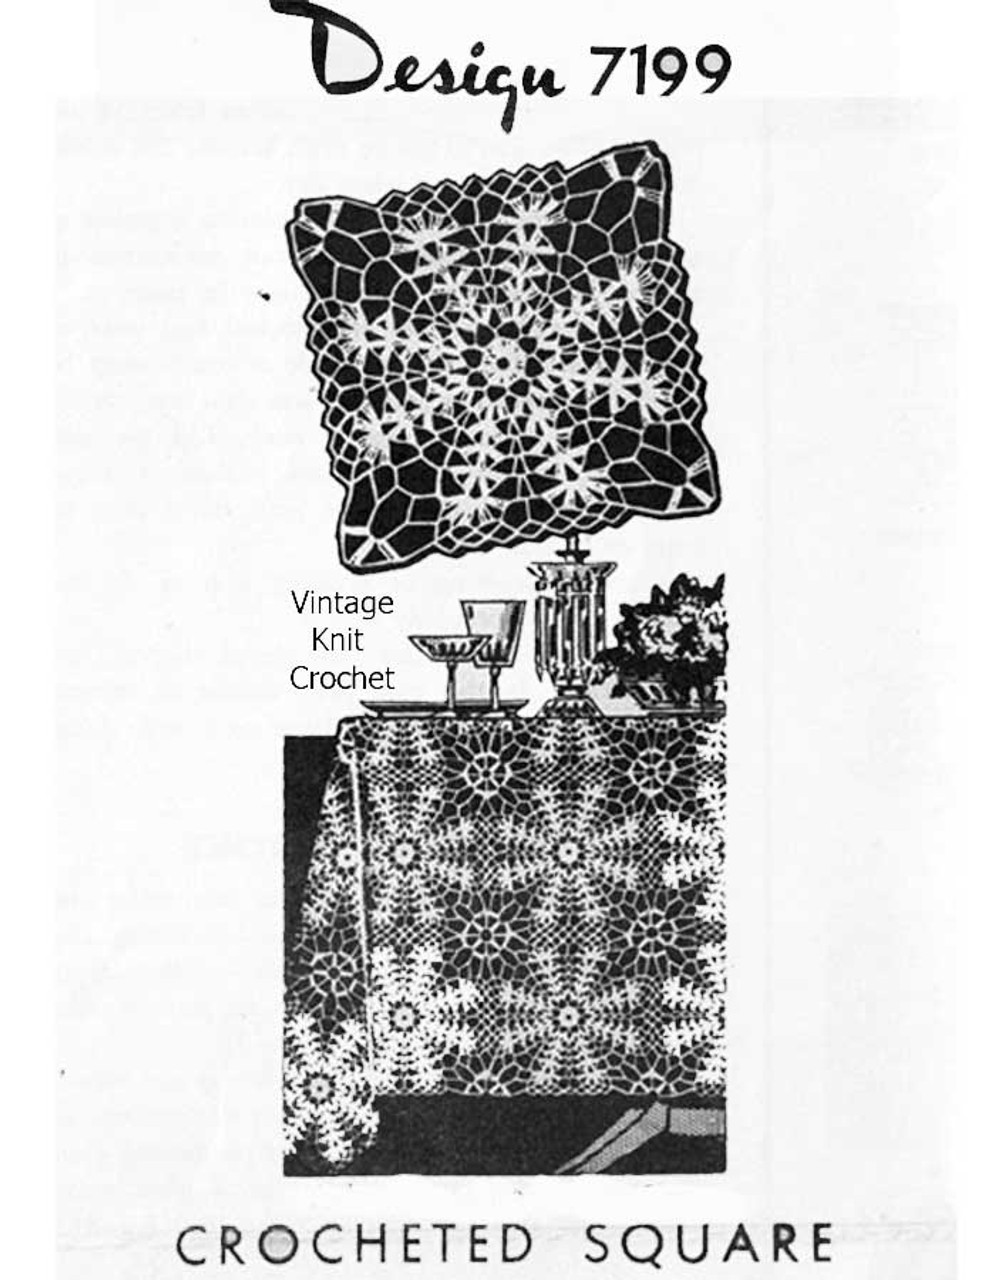 Bedspread Square Crochet Pattern Design 7199